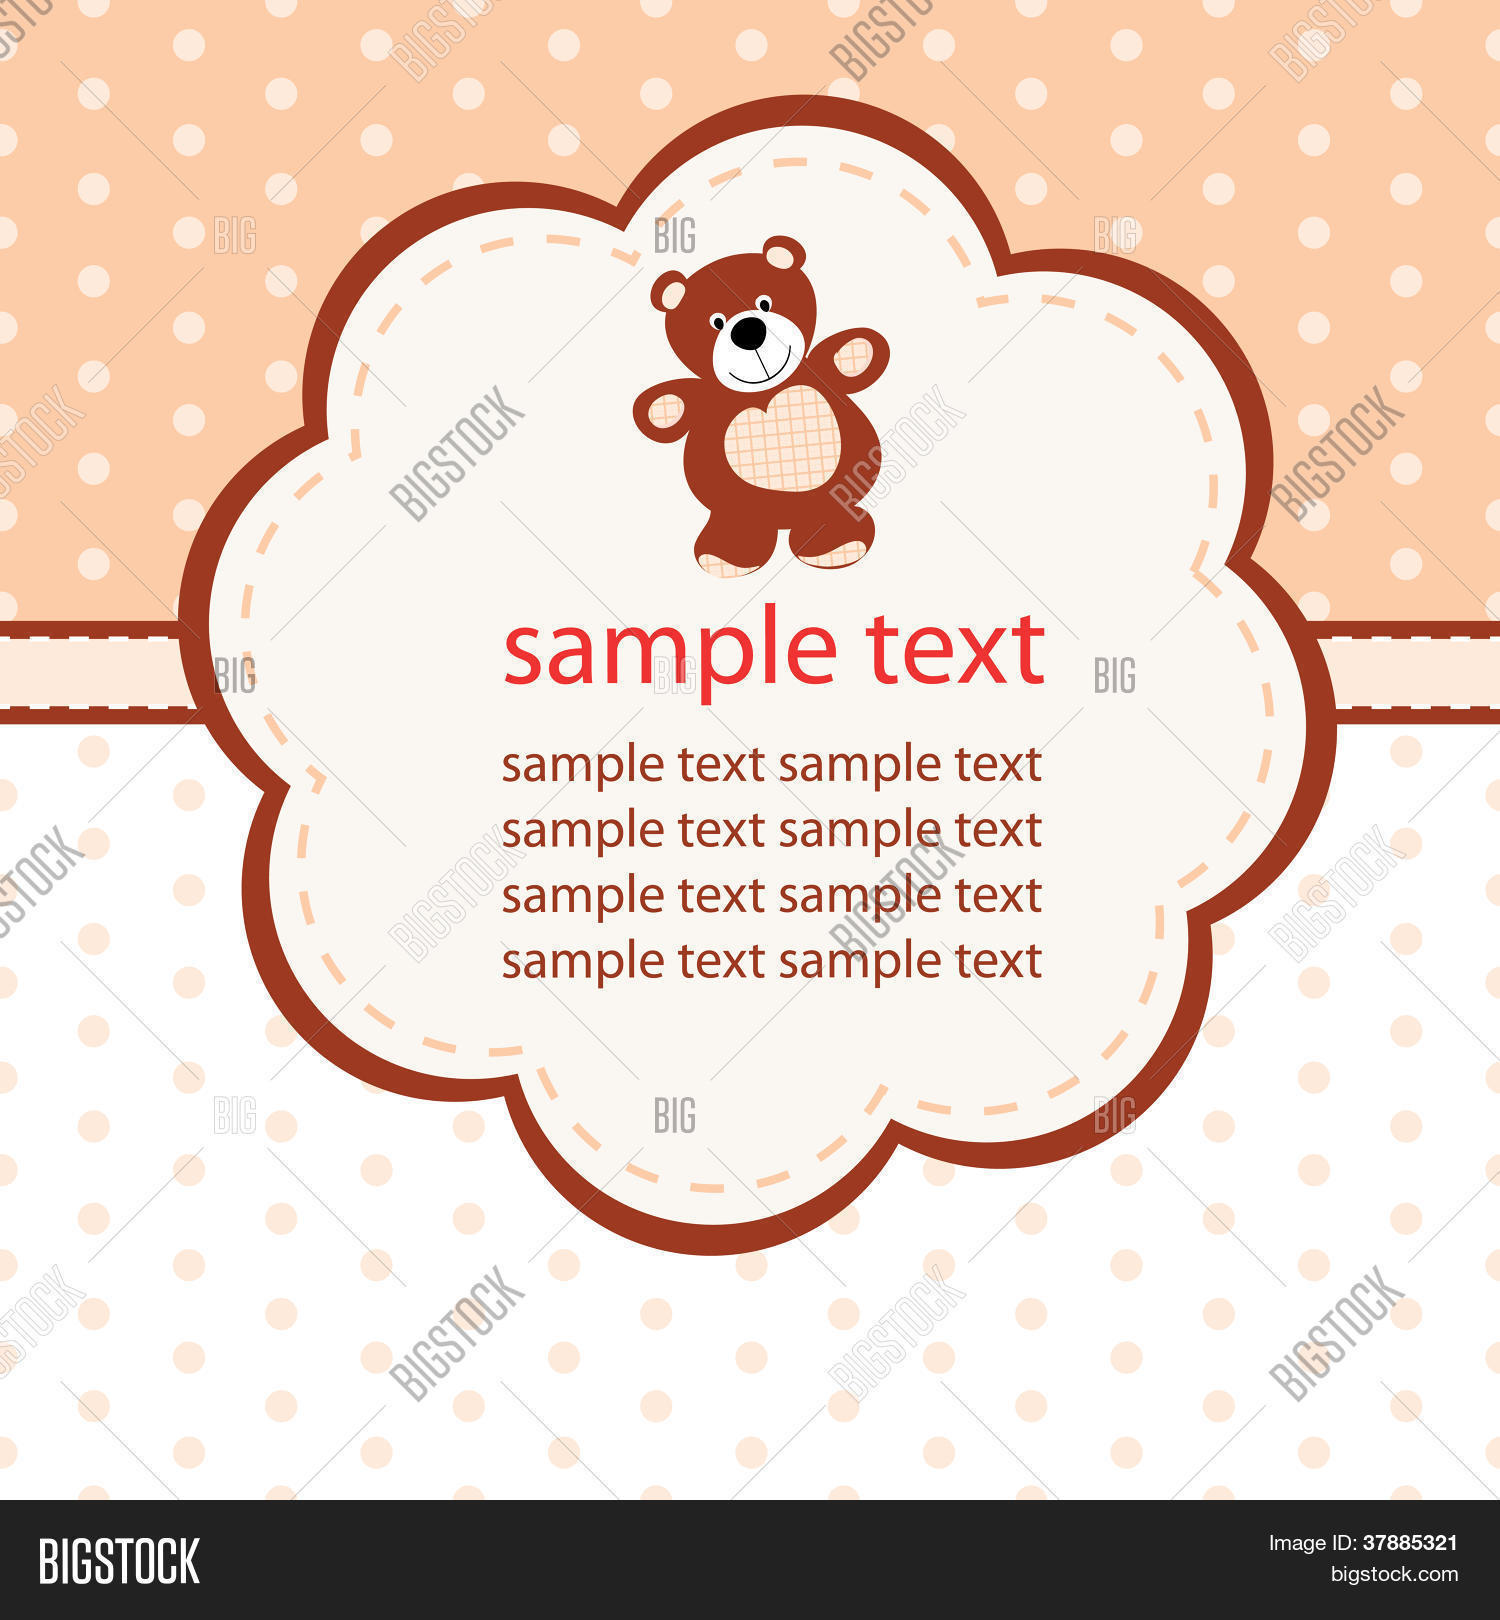 http://www.bigstockphoto.mx/image-37885138/stock-vector-vector ...